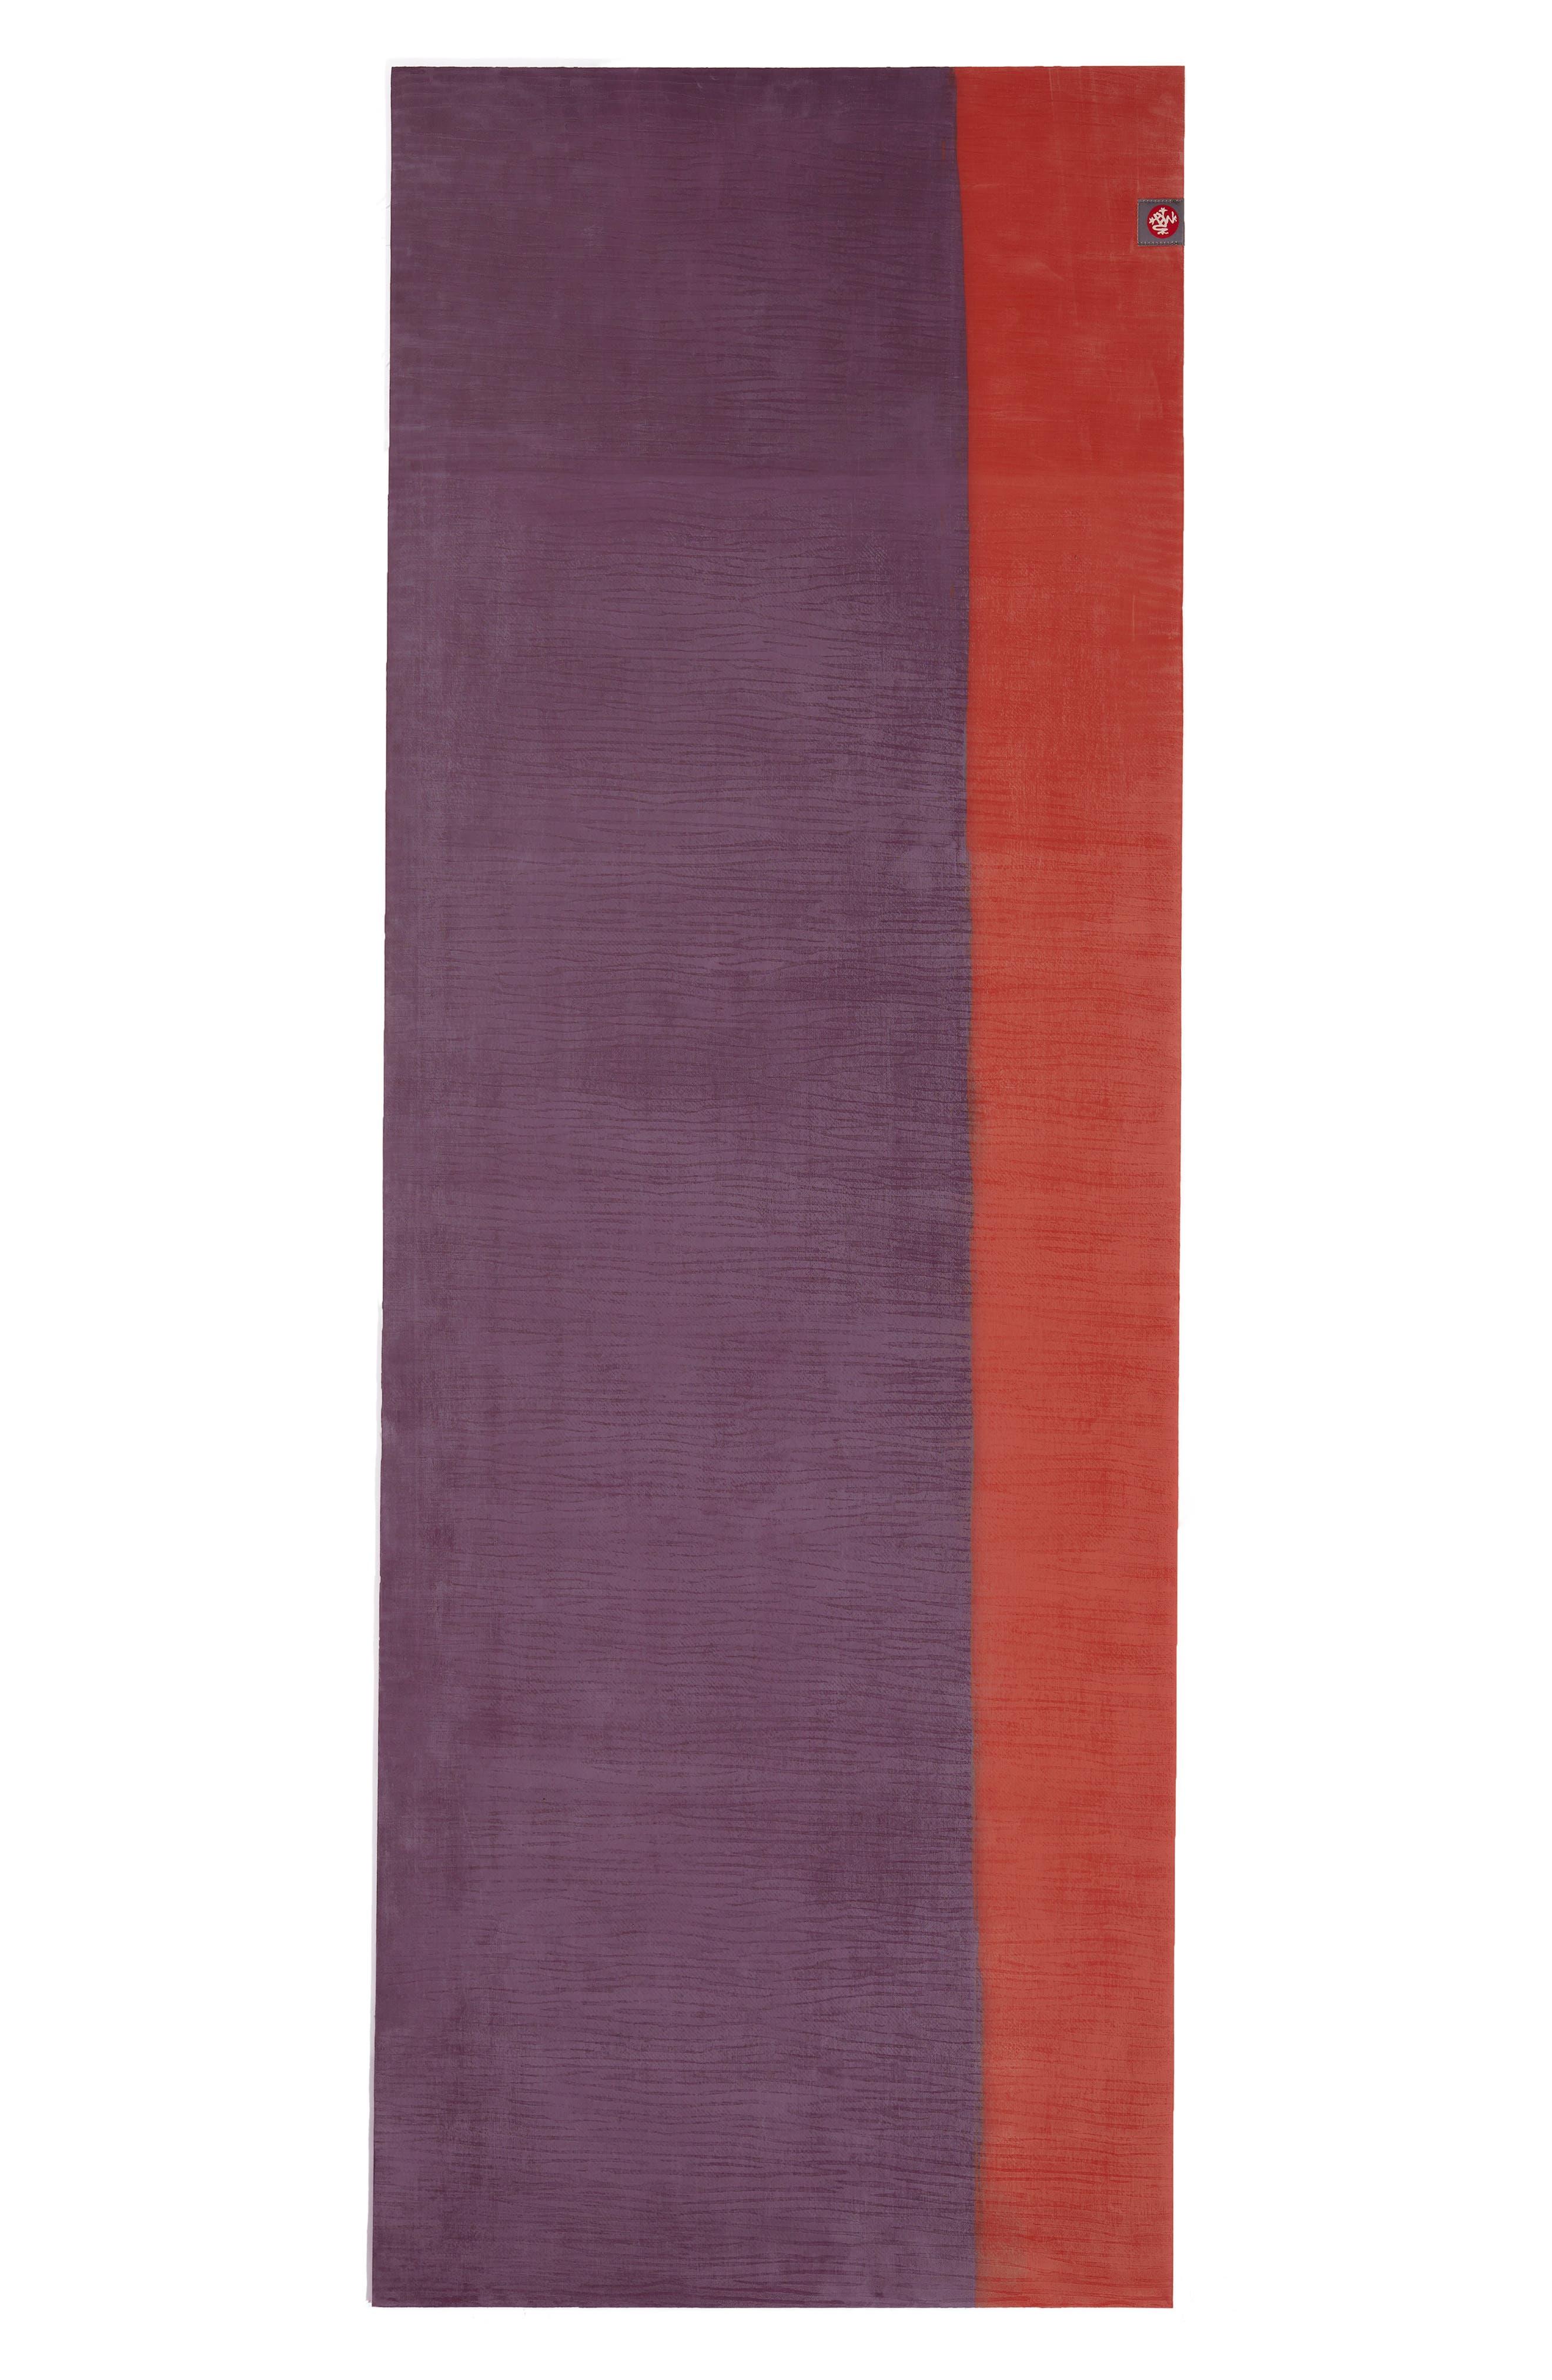 eKO<sup>®</sup> Lite 4mm Yoga Mat,                         Main,                         color, KHANGAI